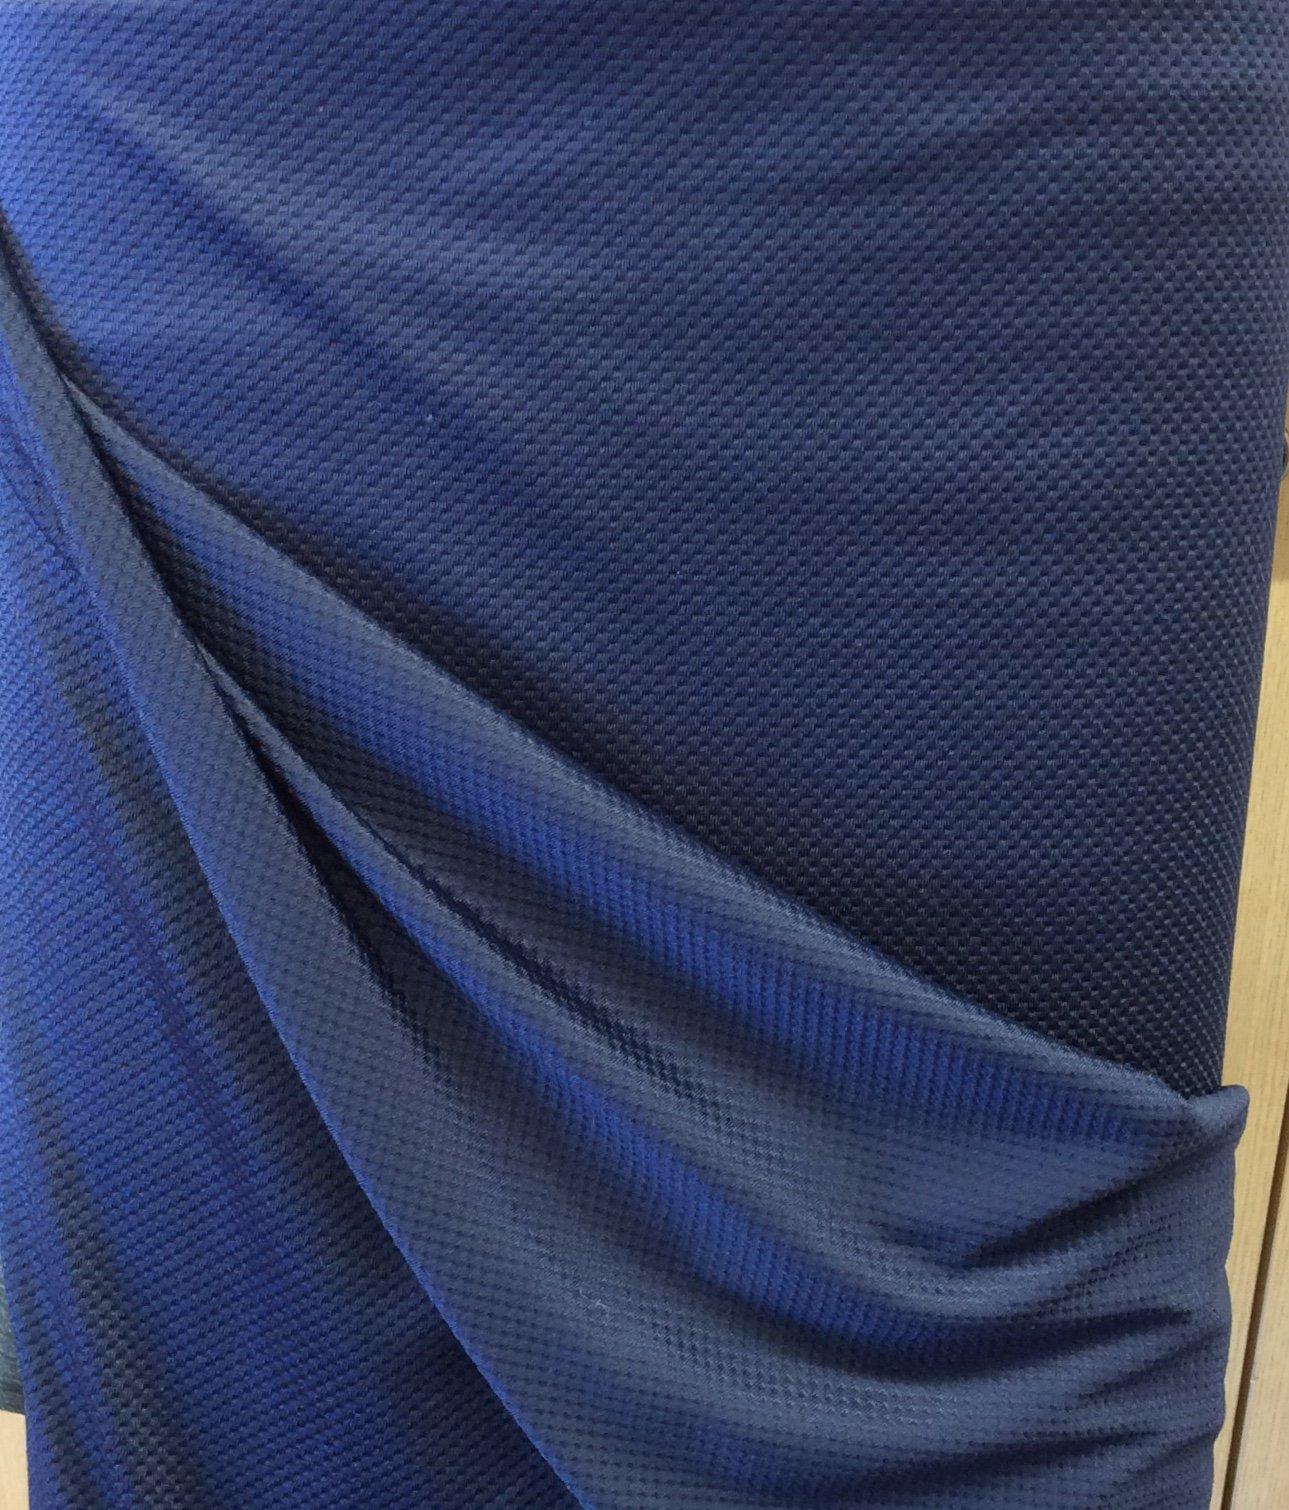 Lycra Textured Navy Blue